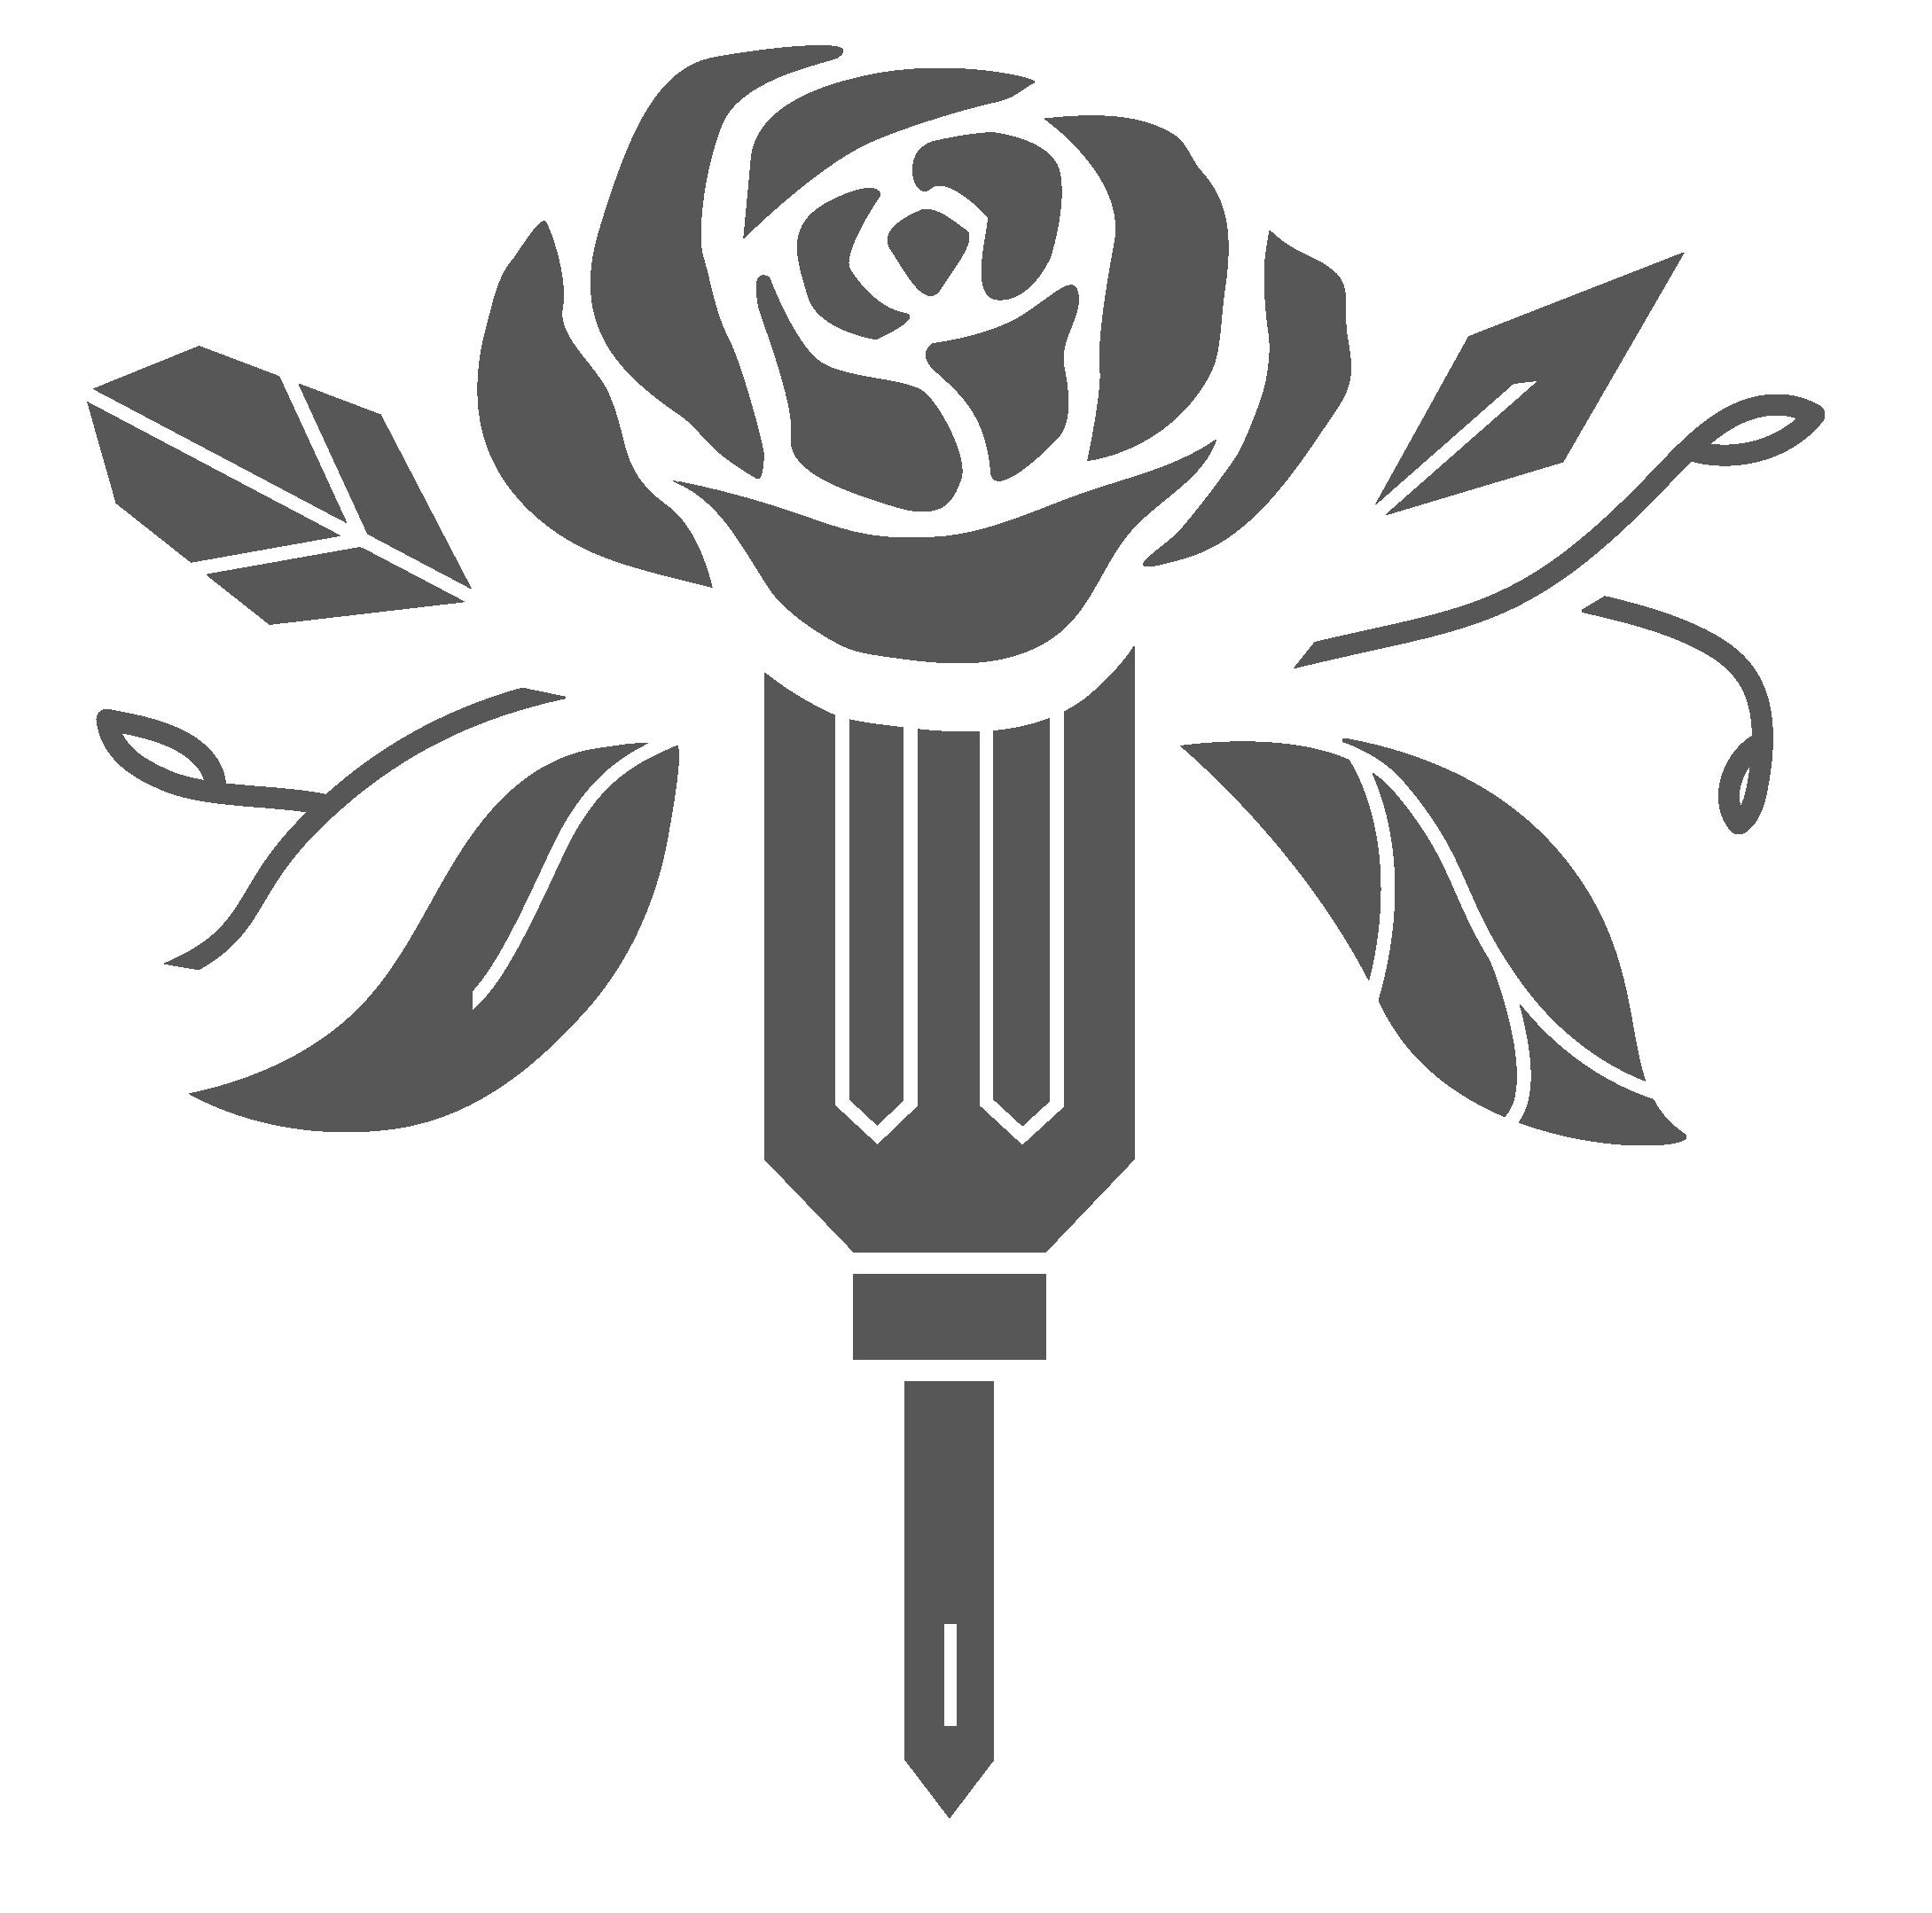 TSG_Logos_Grey_WEB_TransparentBackground - Emblem.png